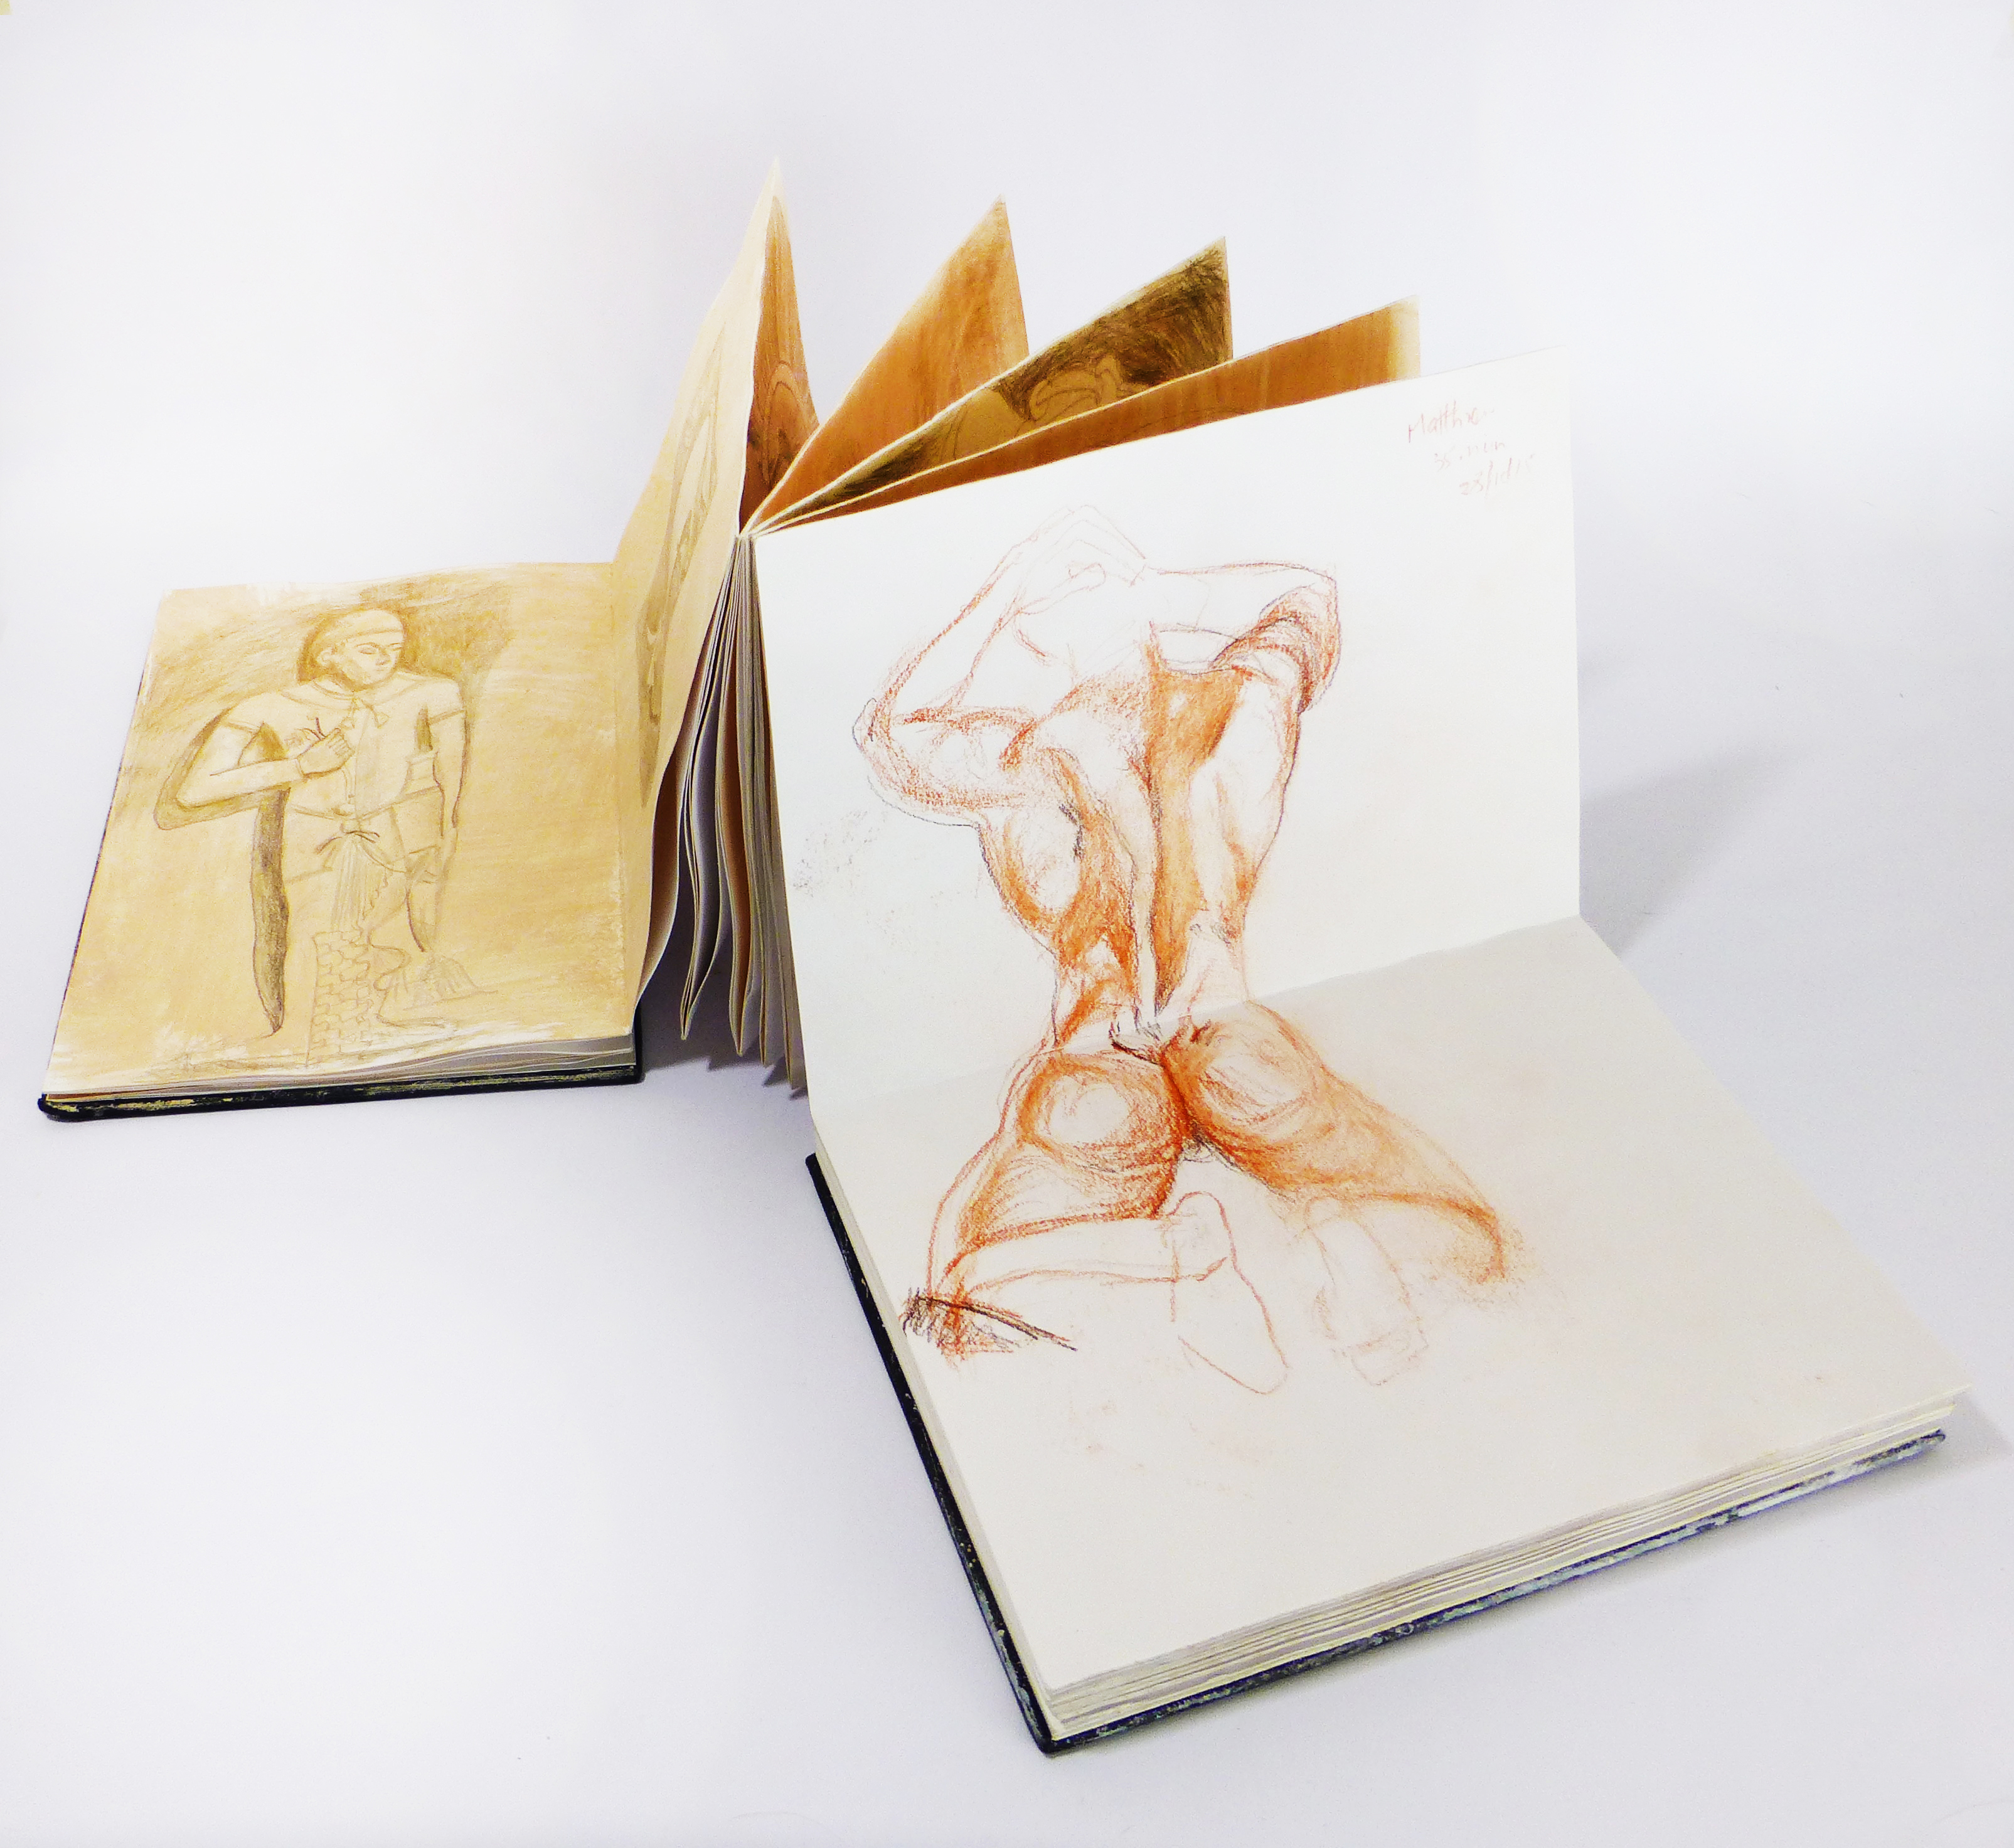 Sketch book drawings by Art by Divya